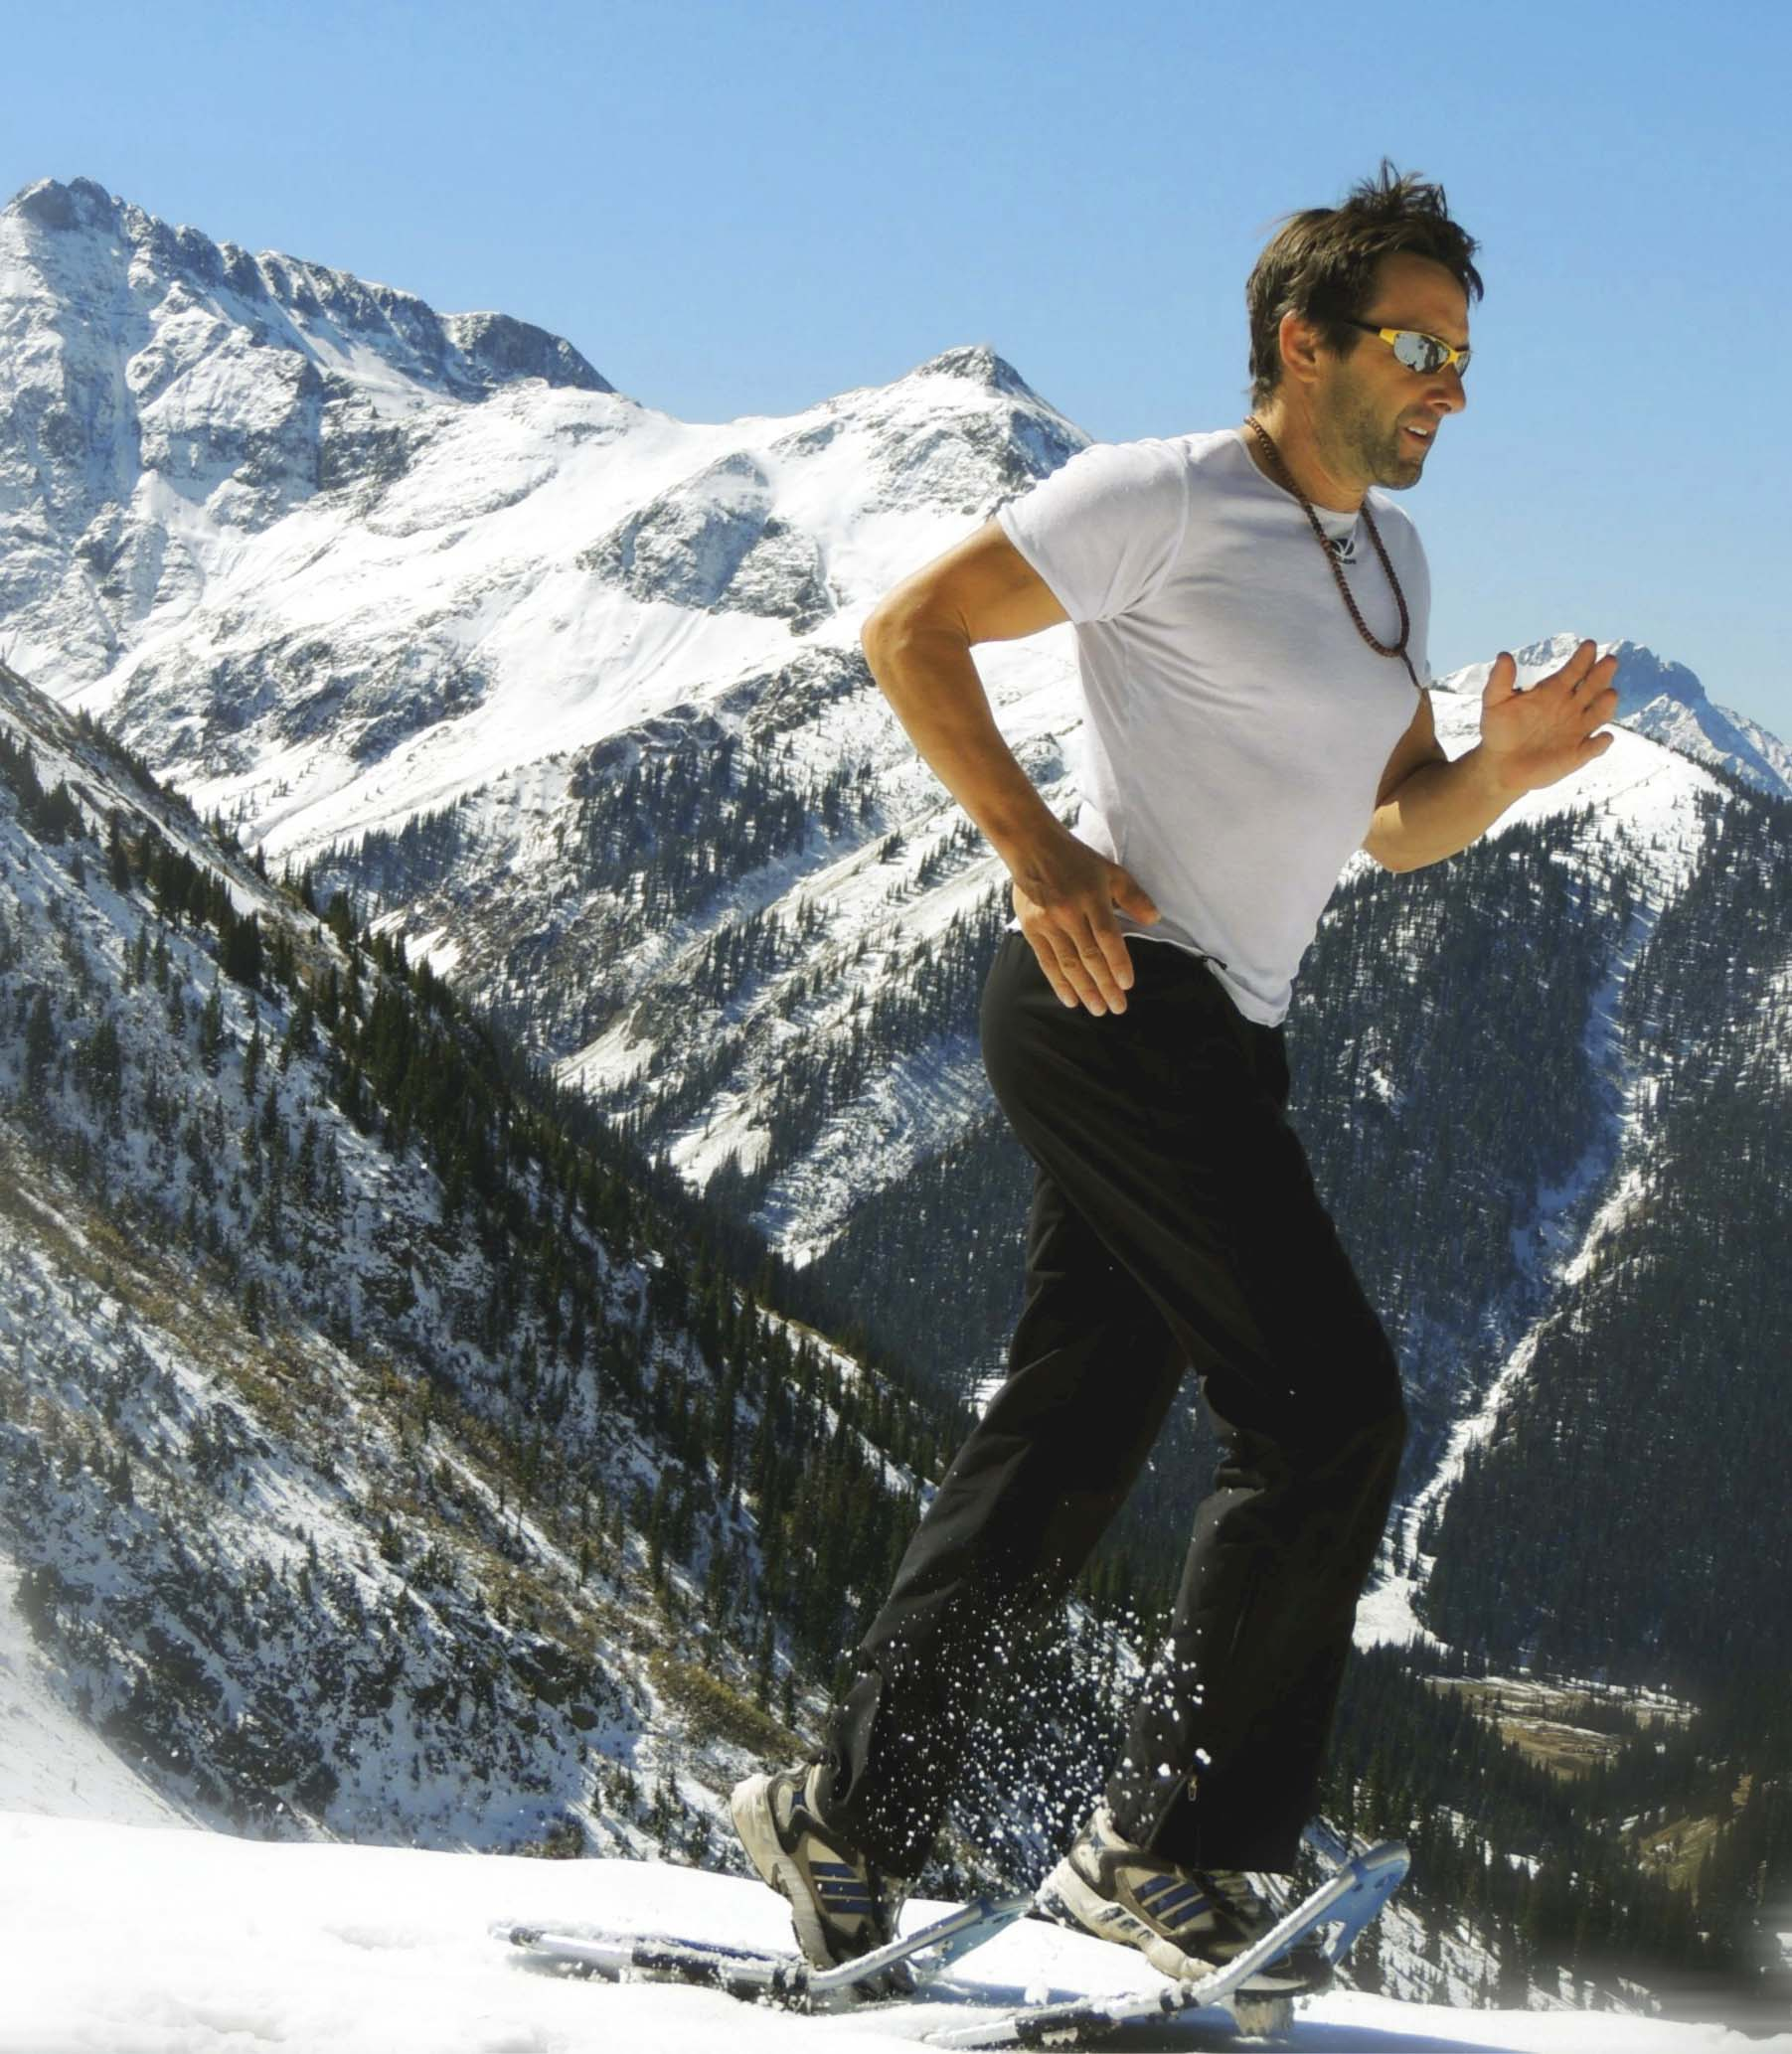 Steve Ilg snowshoe training at altitude